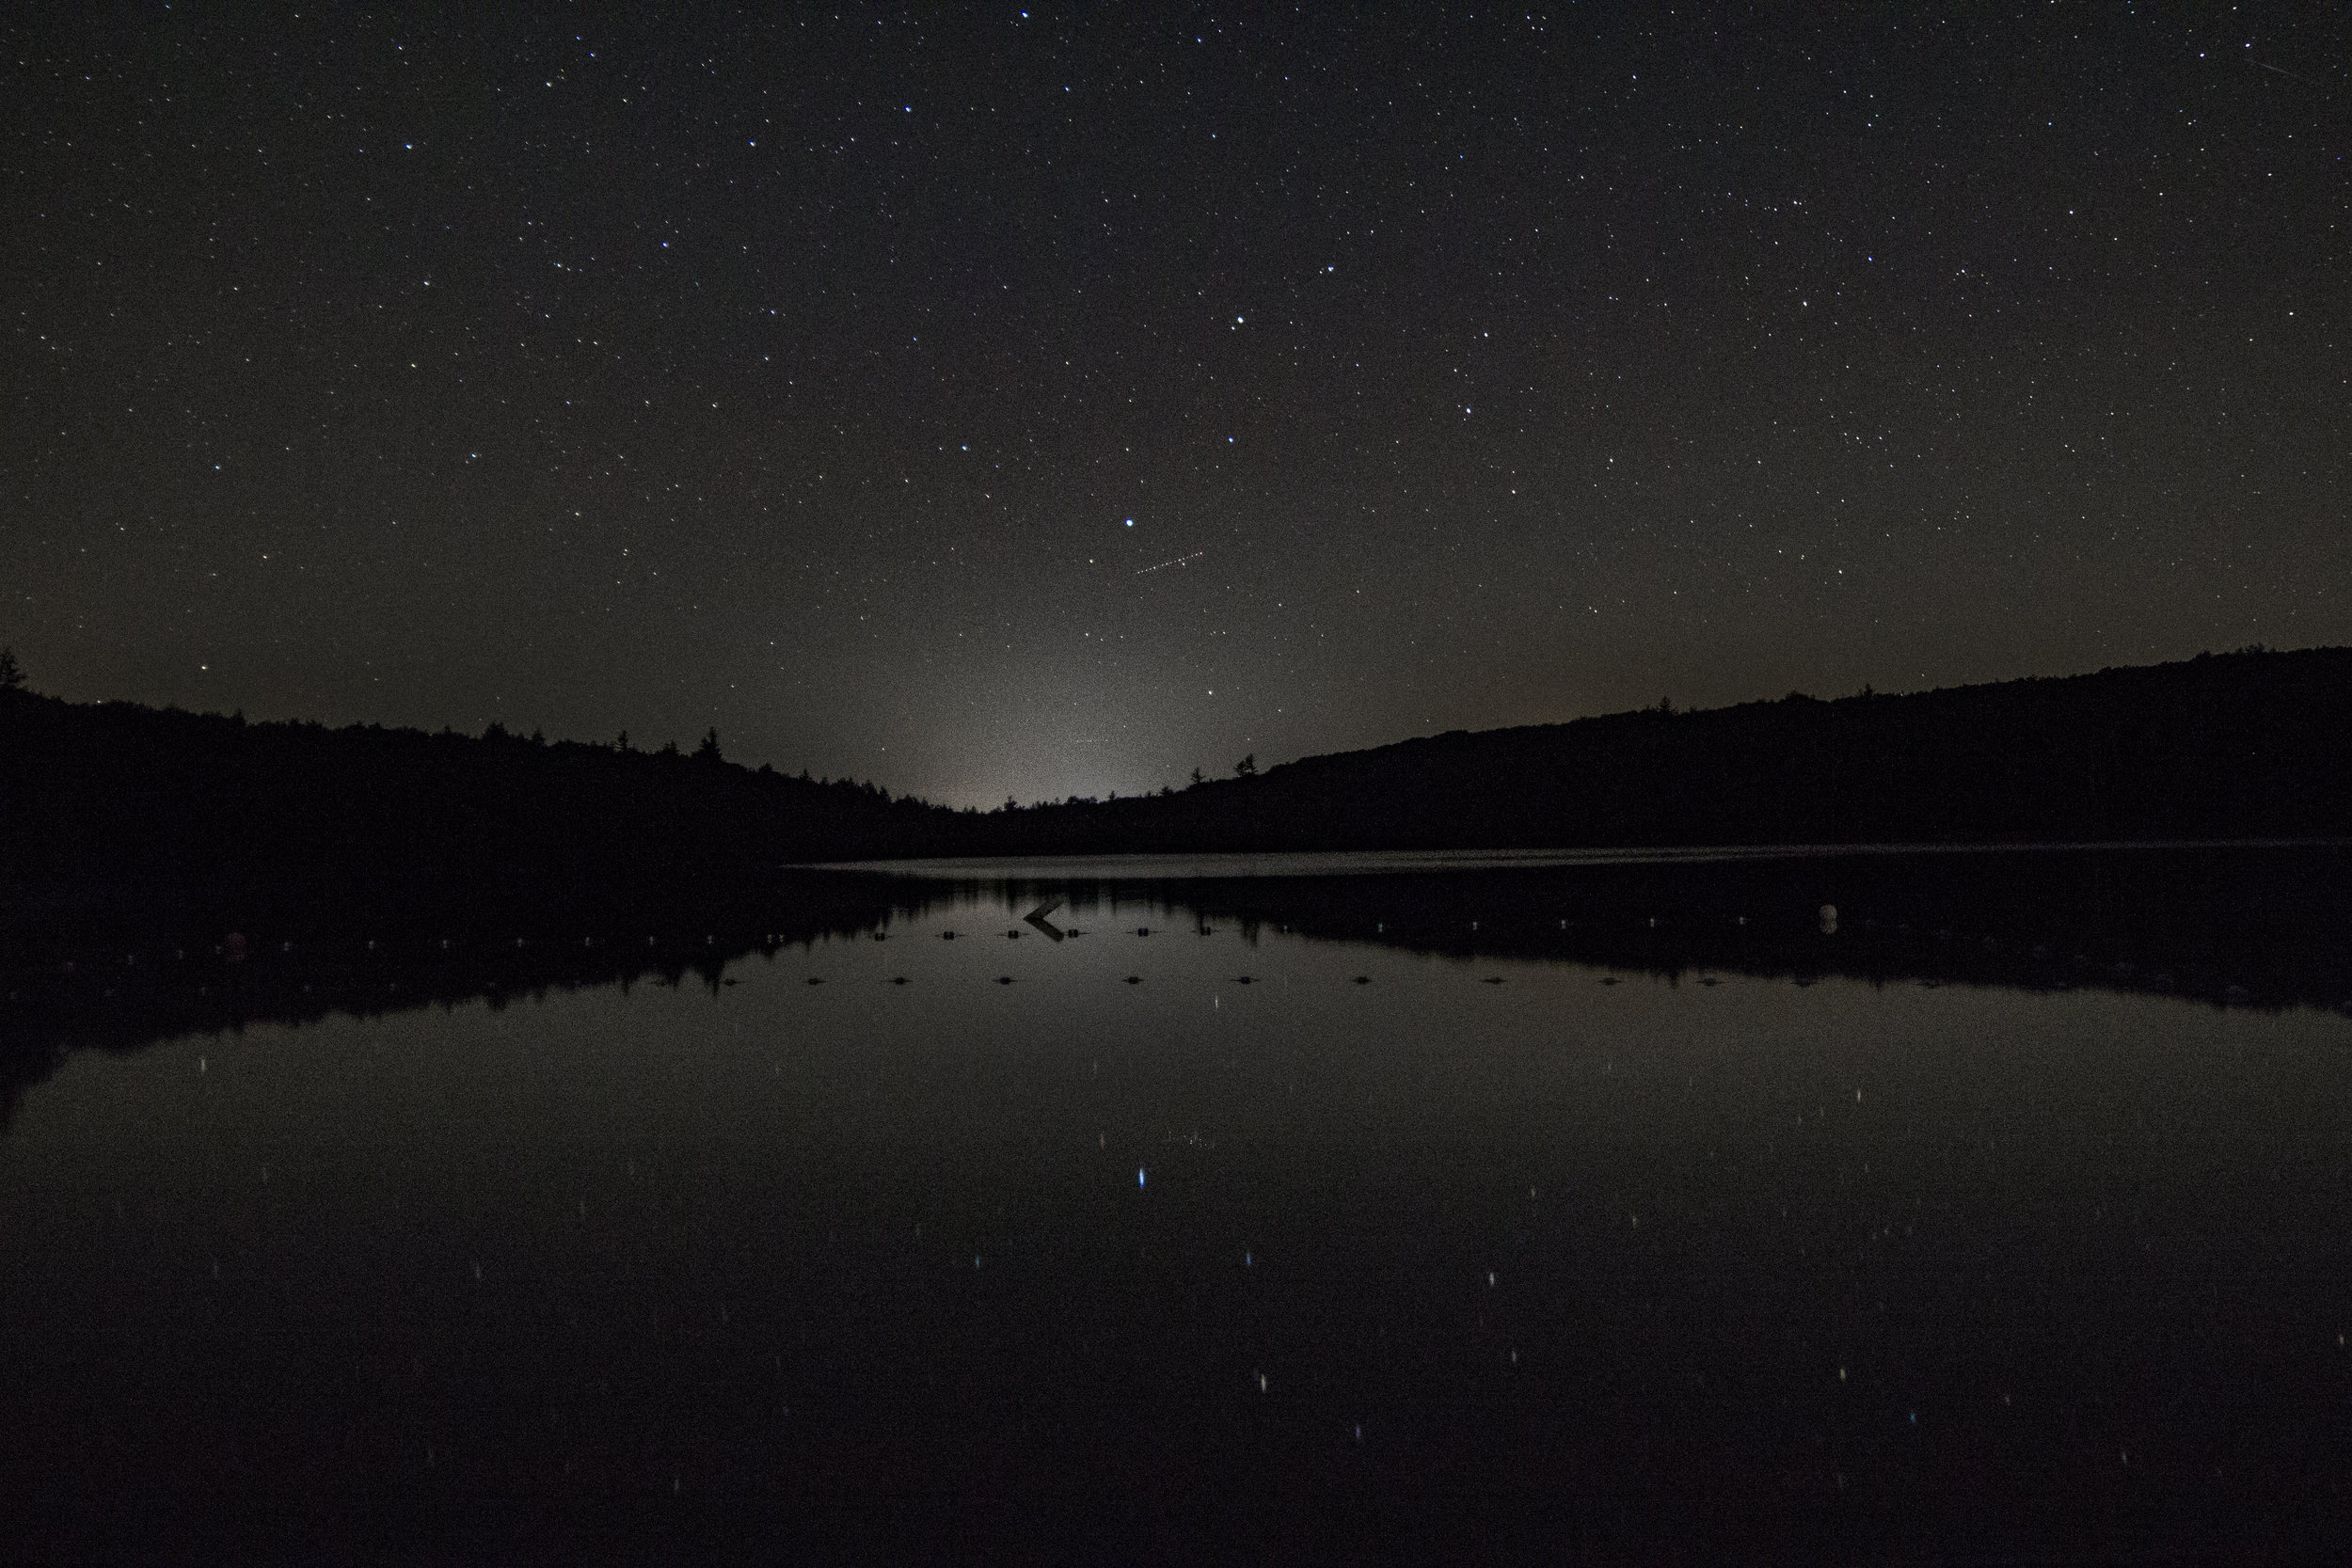 The Pleiades. Photo credit: Laura Mitchell